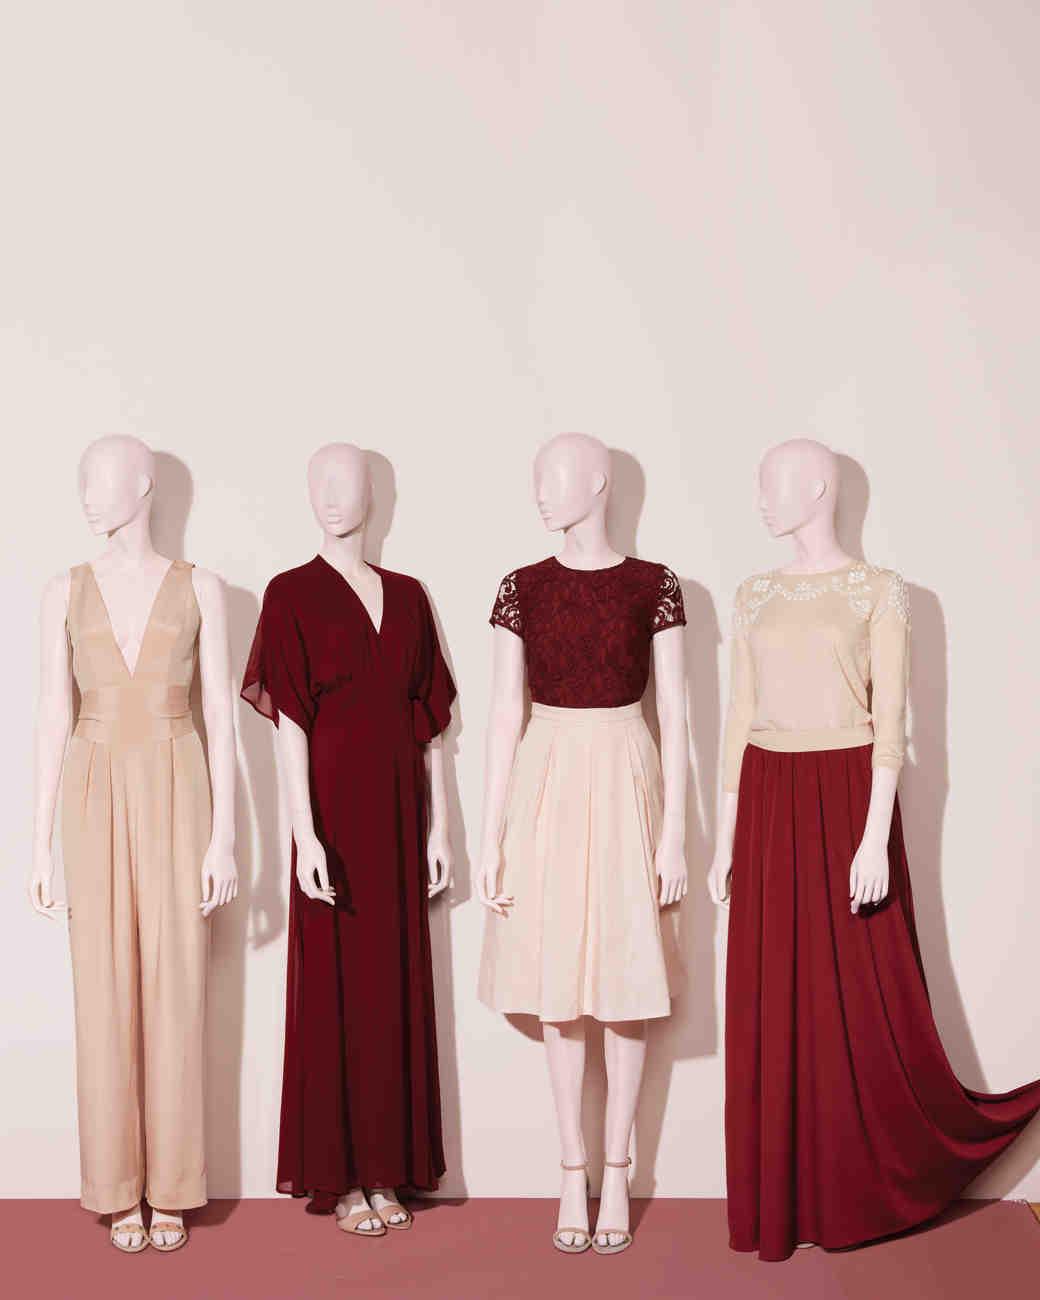 blush berry bridesmaids dresses on mannequin